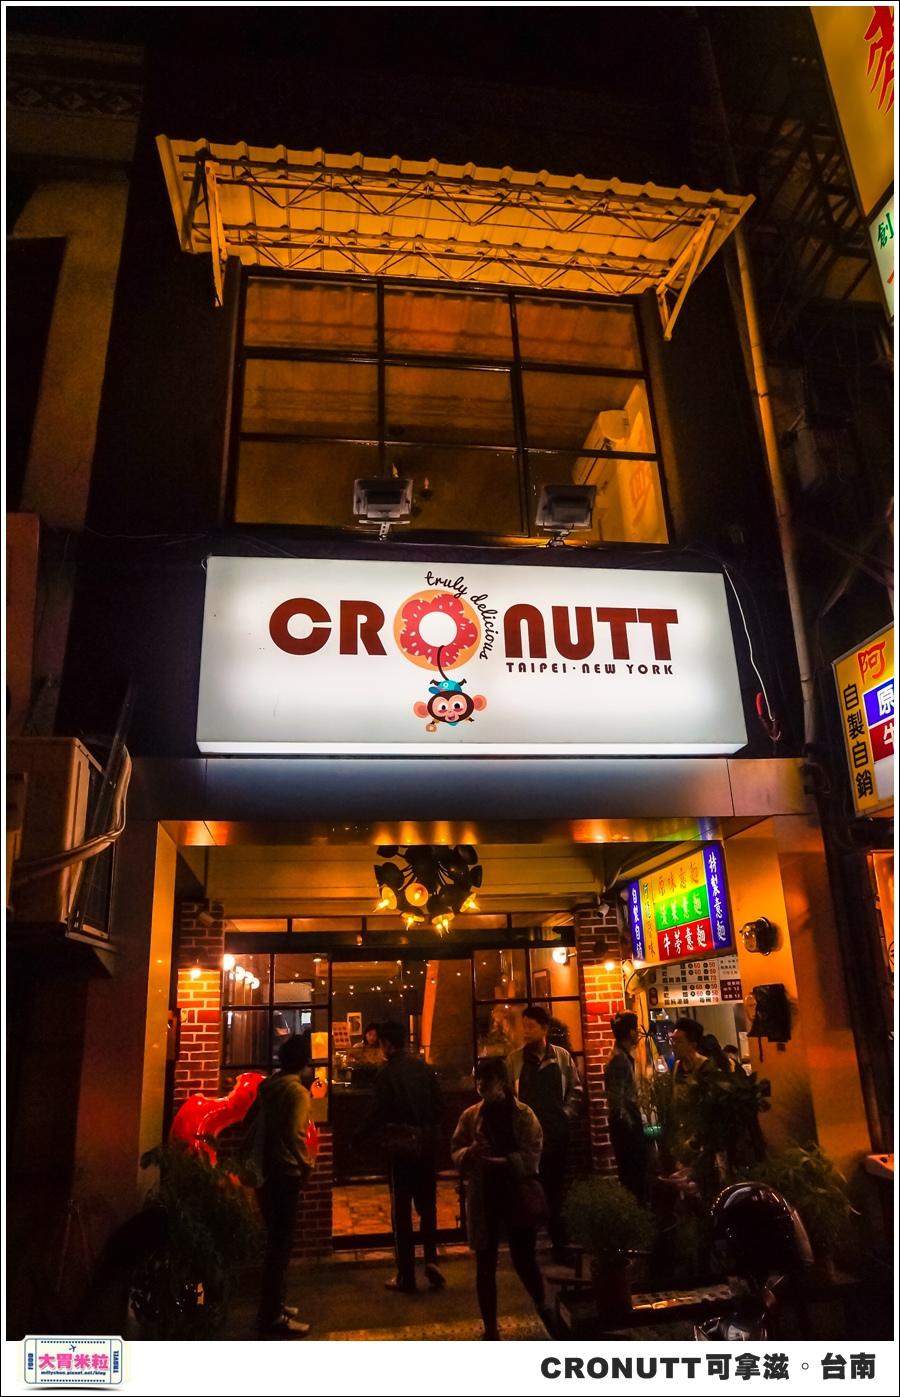 CRONUTT可拿滋台南店@紐約可頌甜甜圈@大胃米粒0051.jpg